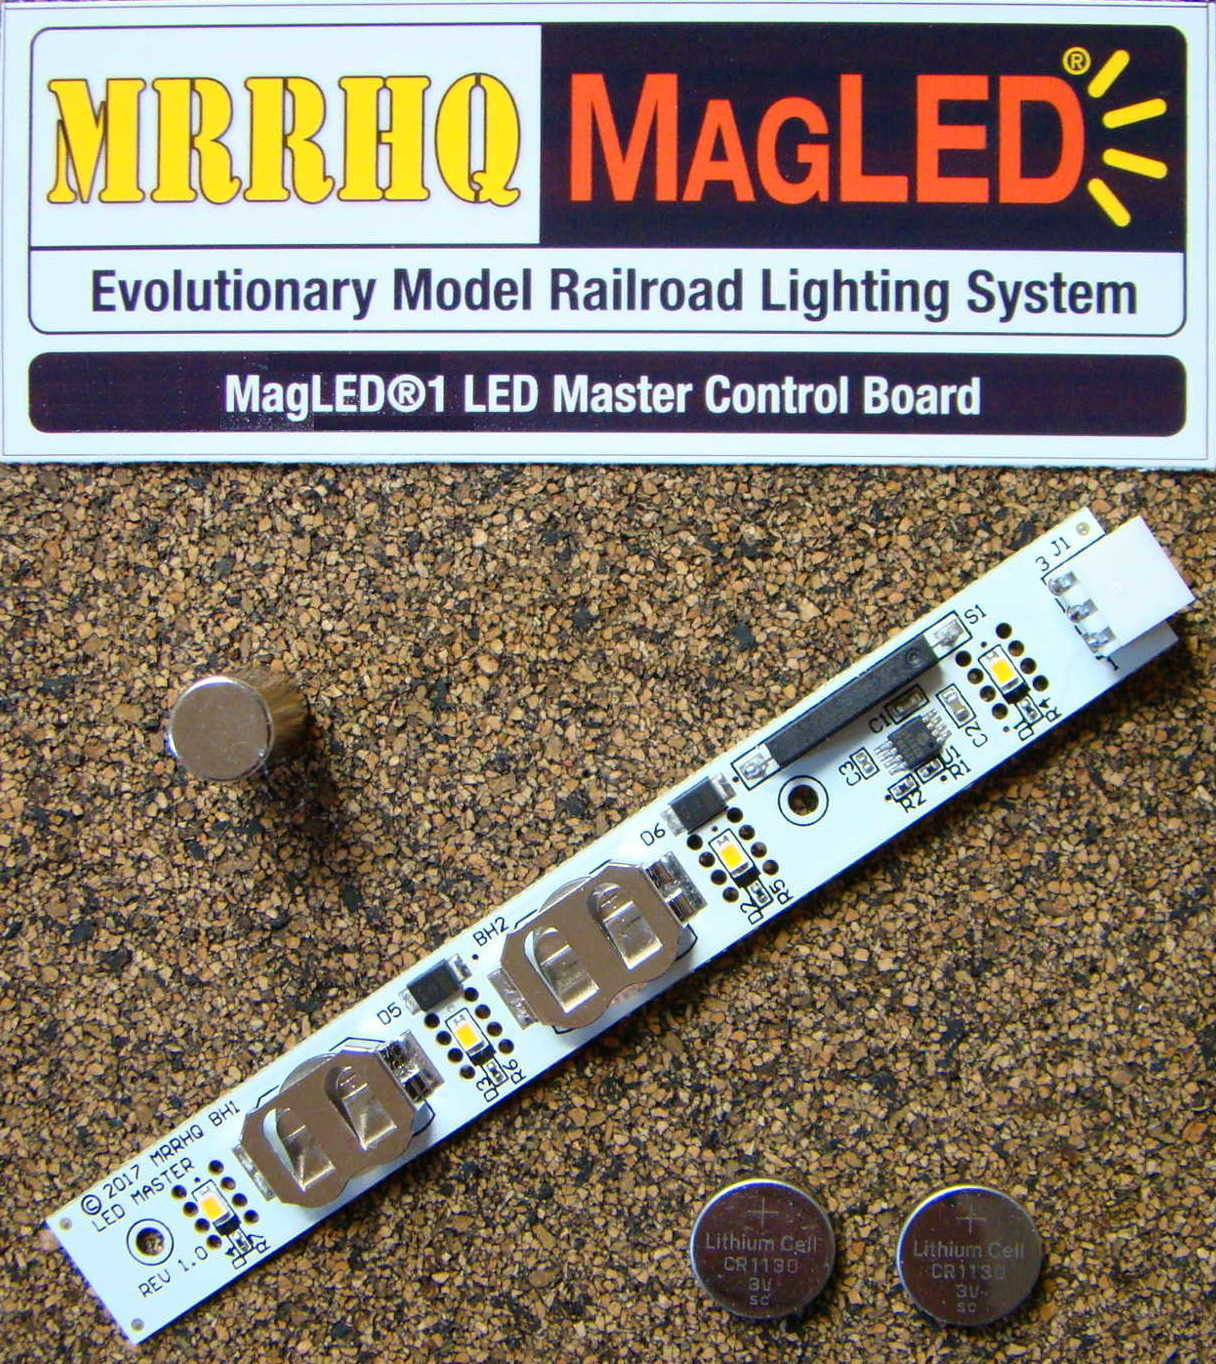 MRRHQ MagLED® MLM1 Evolutionary Model Railroad Lighting System LED Master Control Board w/Magnet